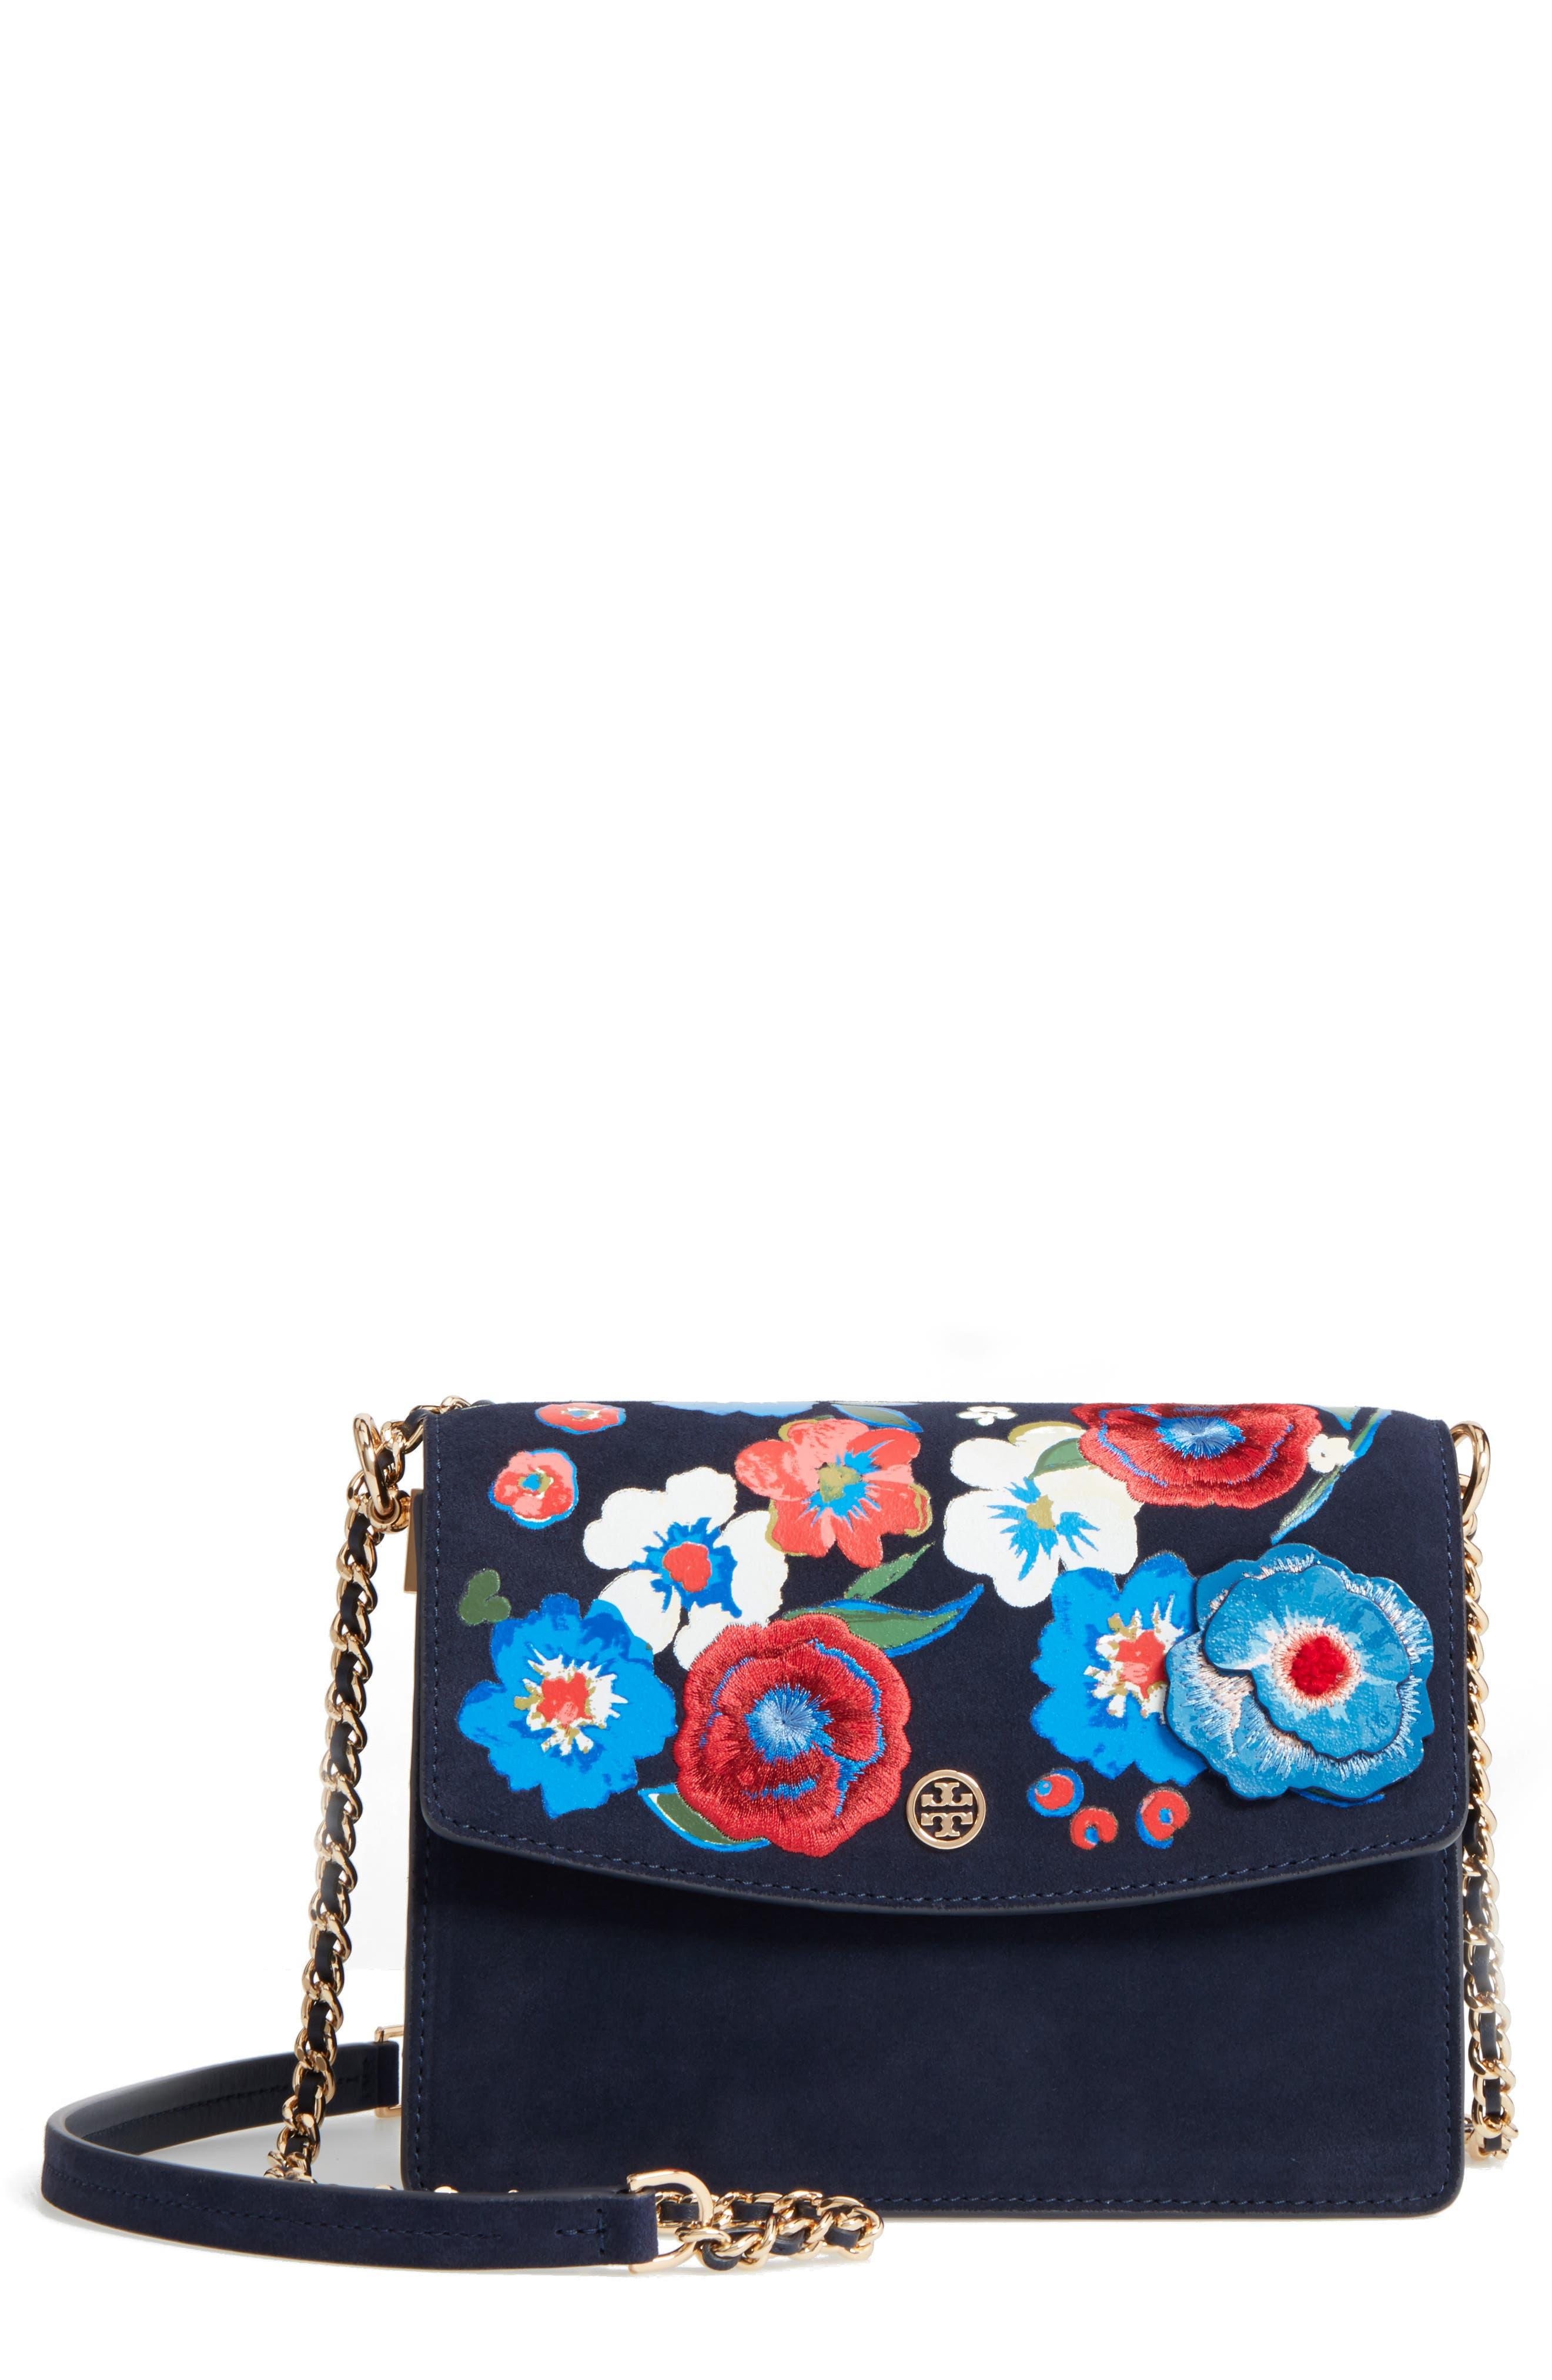 Alternate Image 1 Selected - Tory Burch Parker Flower Embroidered Leather Shoulder/Crossbody Bag